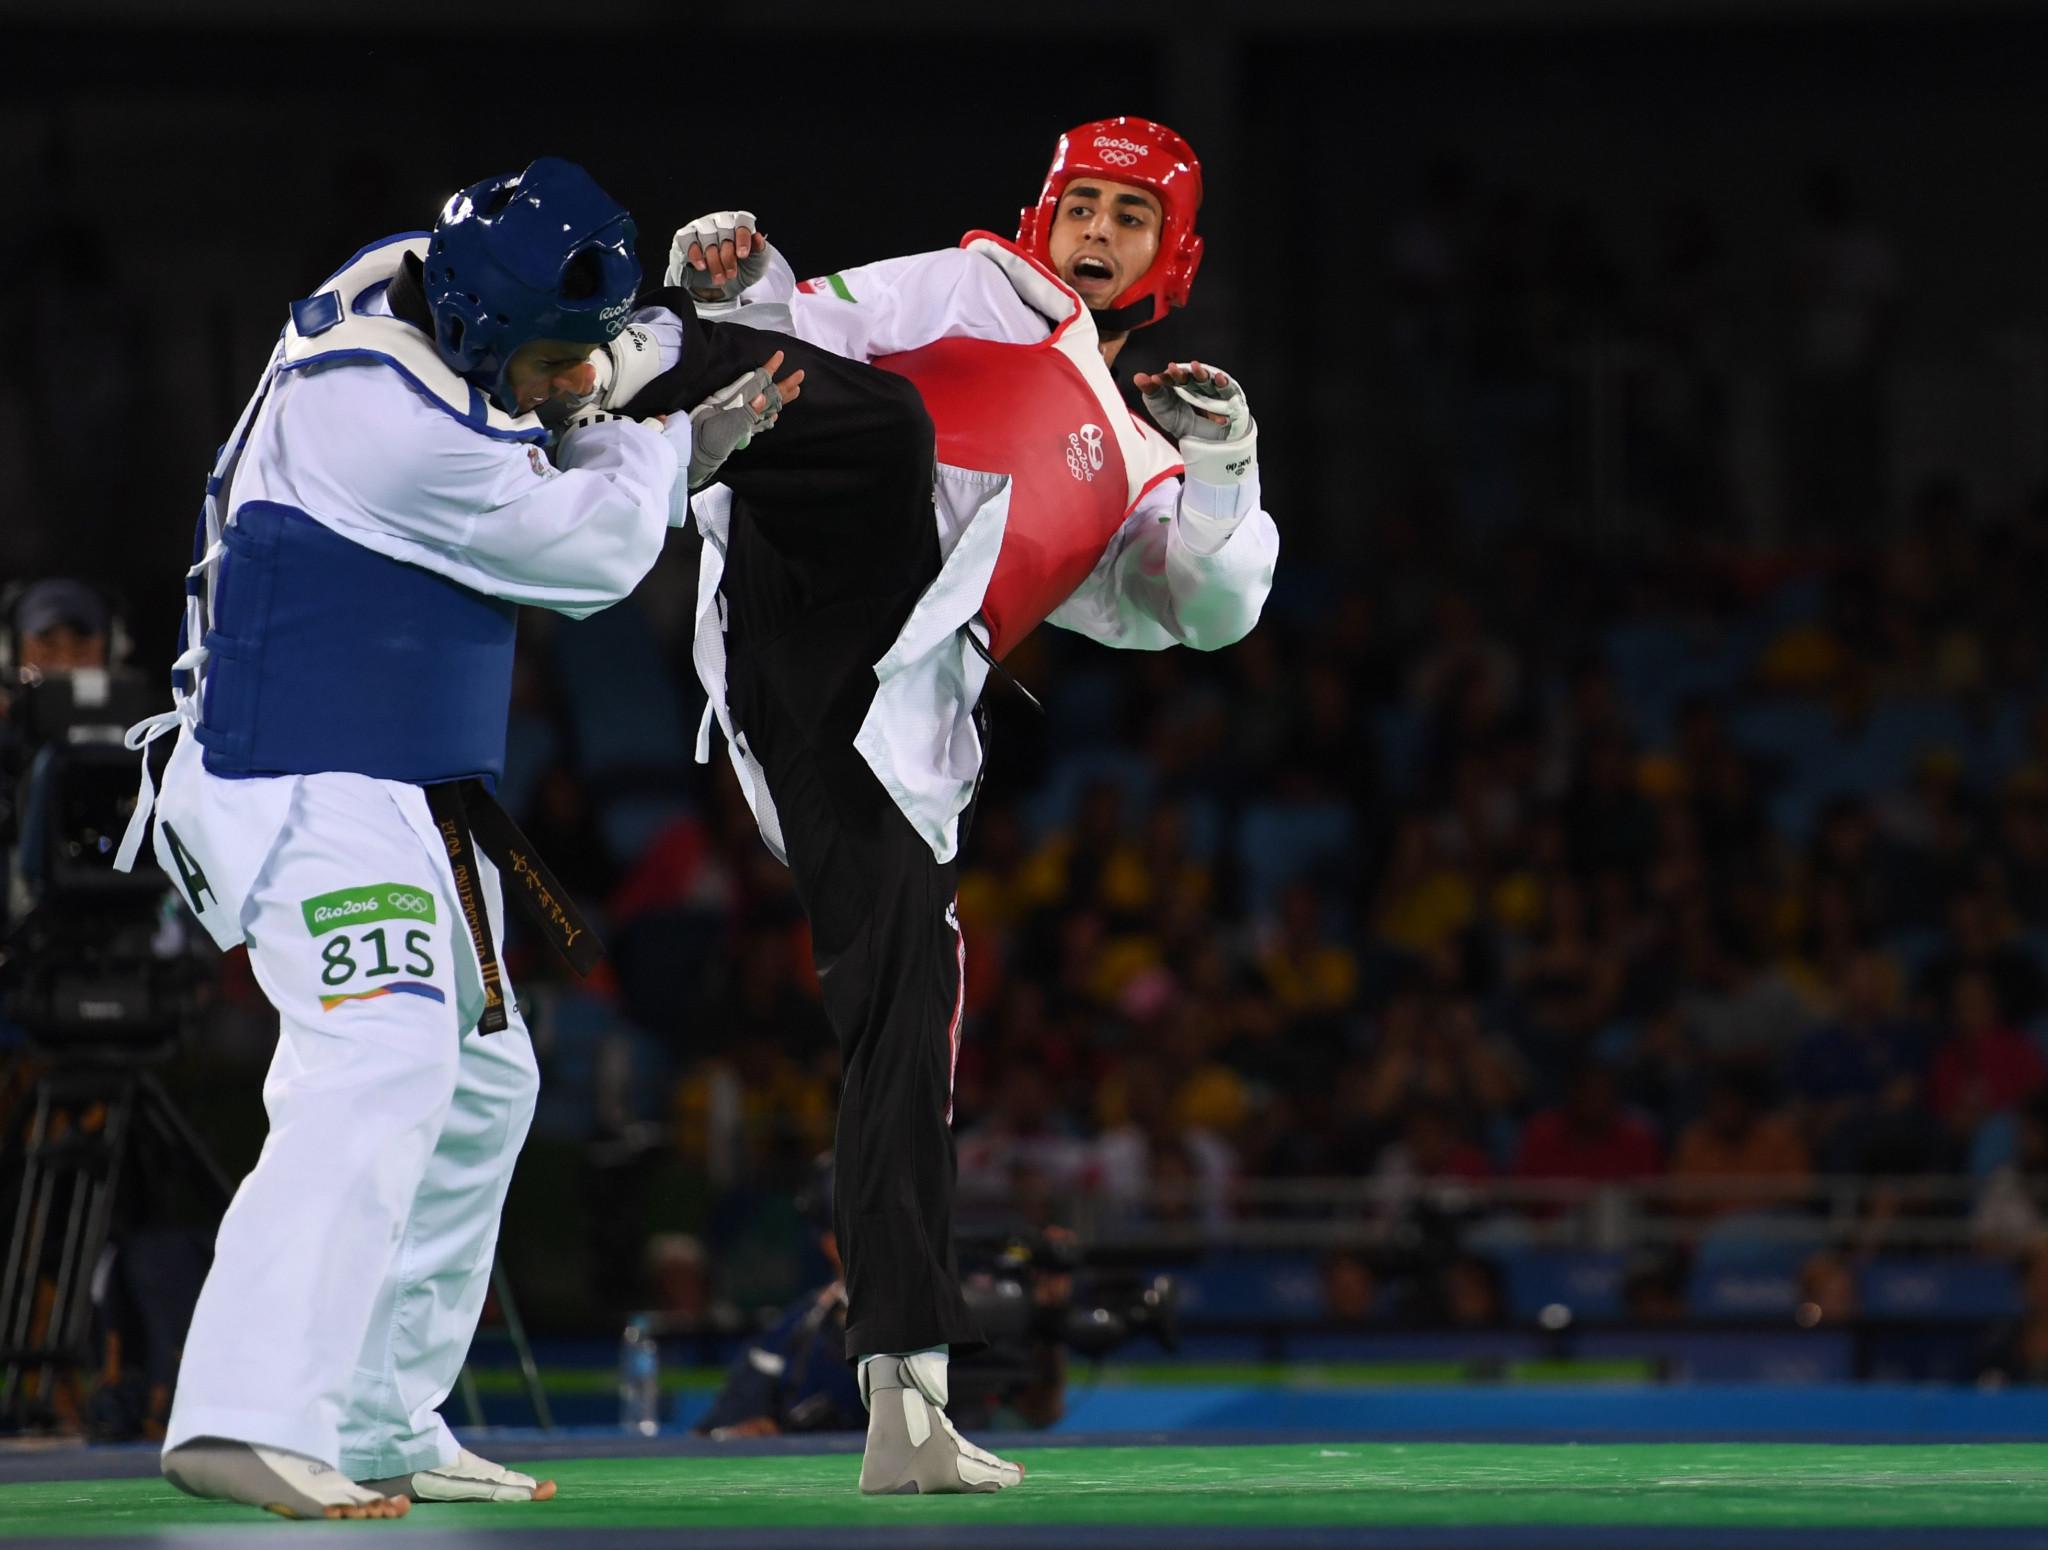 Iran to send strong team to first-ever World Taekwondo Grand Slam Champions Series